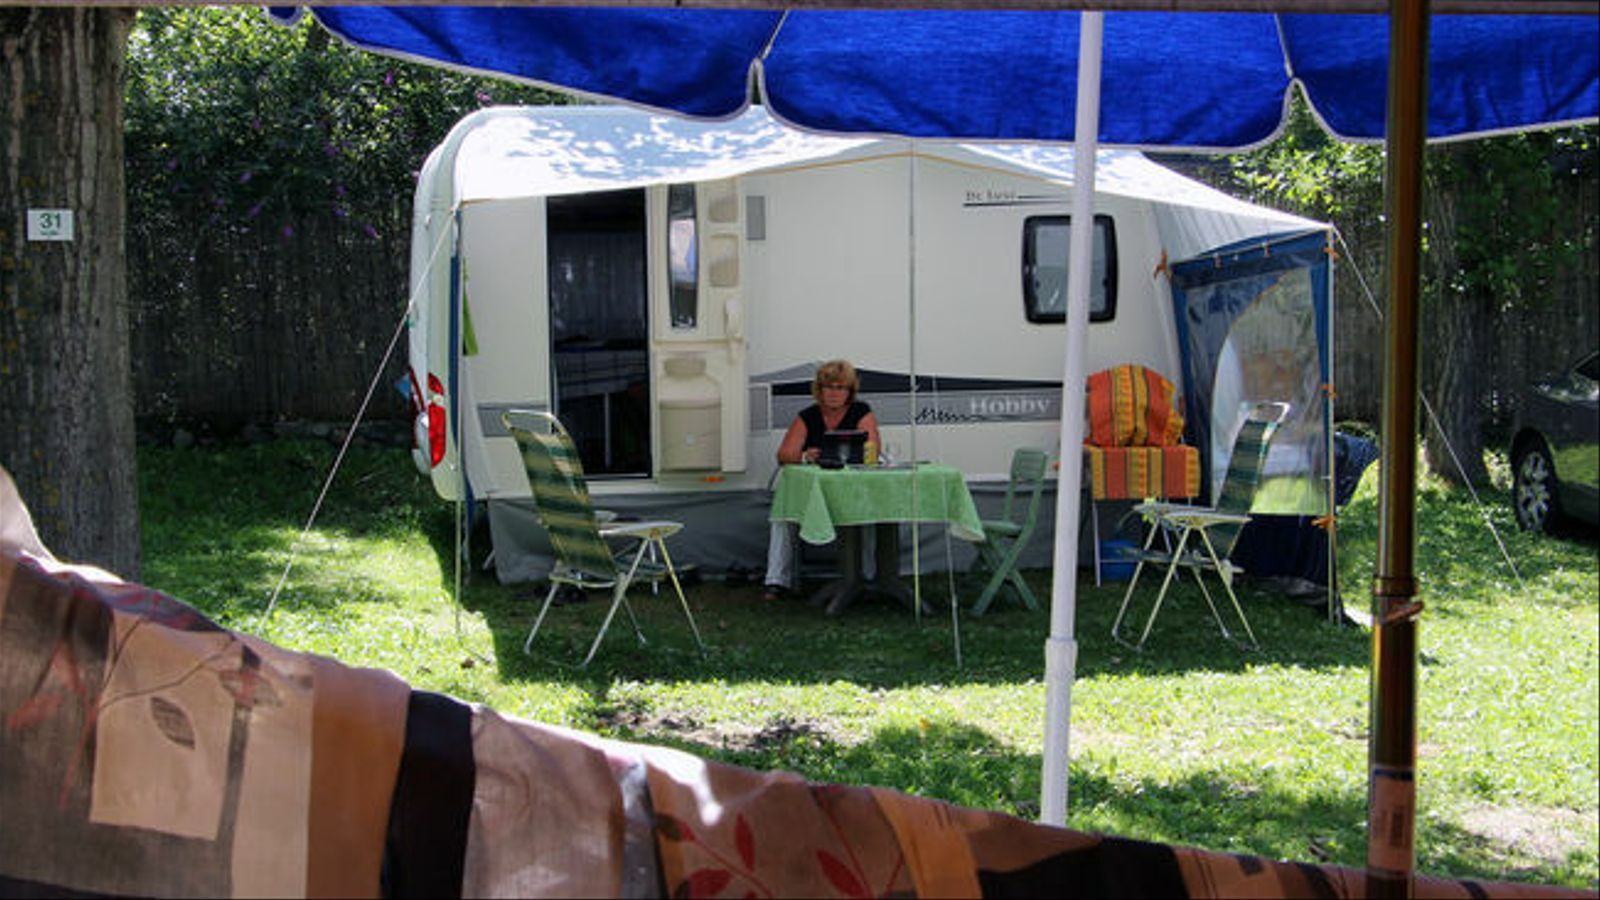 Una caravana en un càmping. / ARXIU ANA